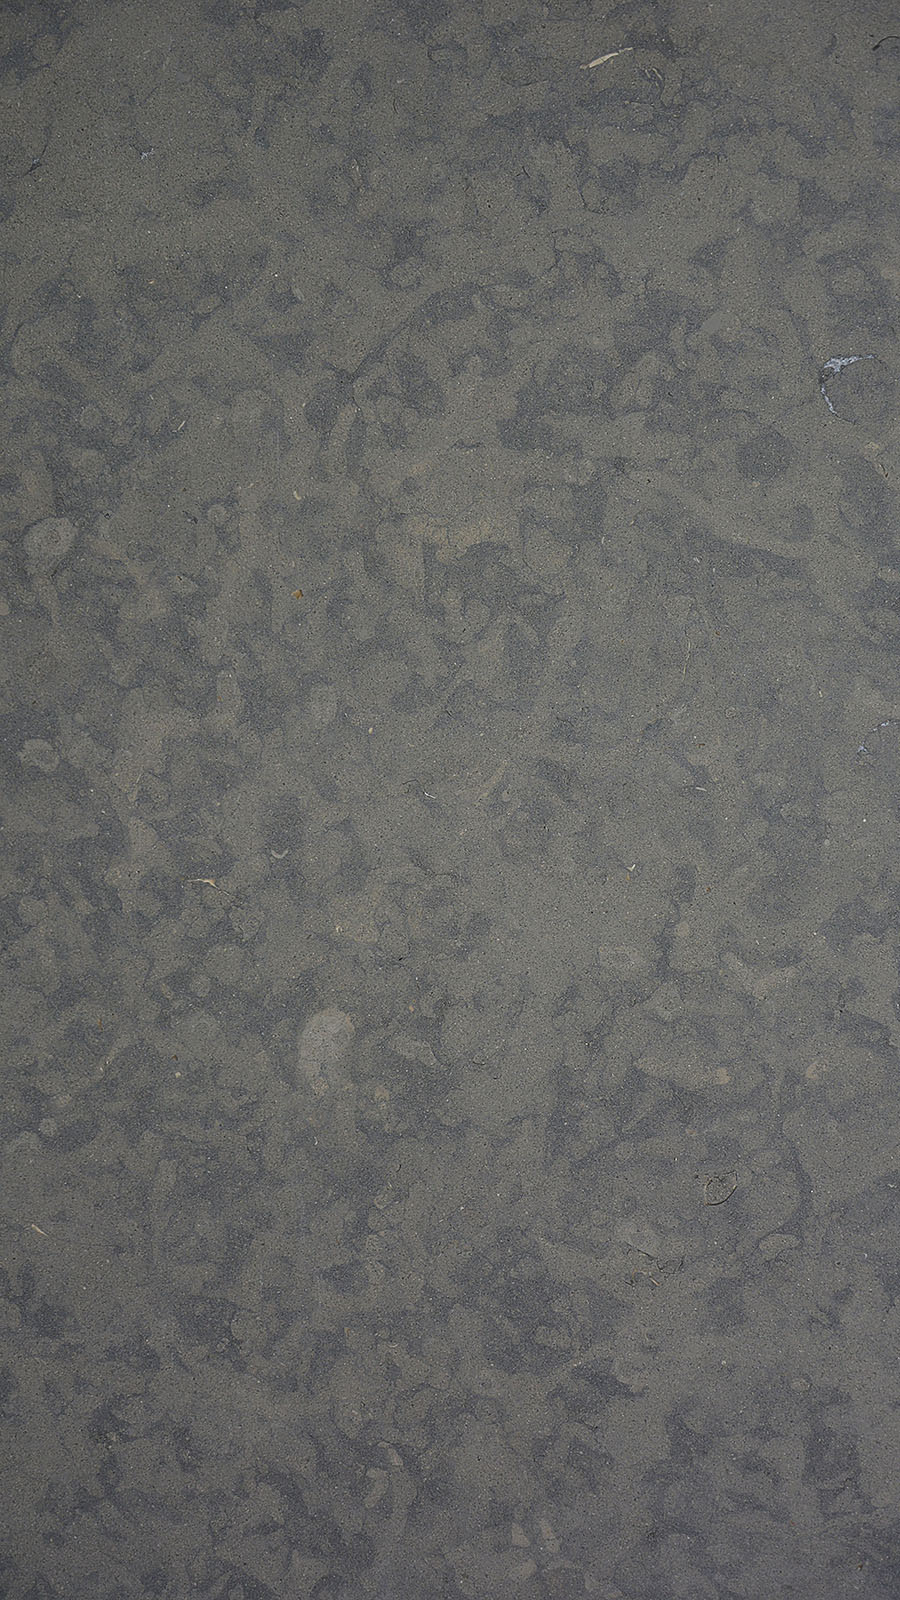 Azul Armani Limestone